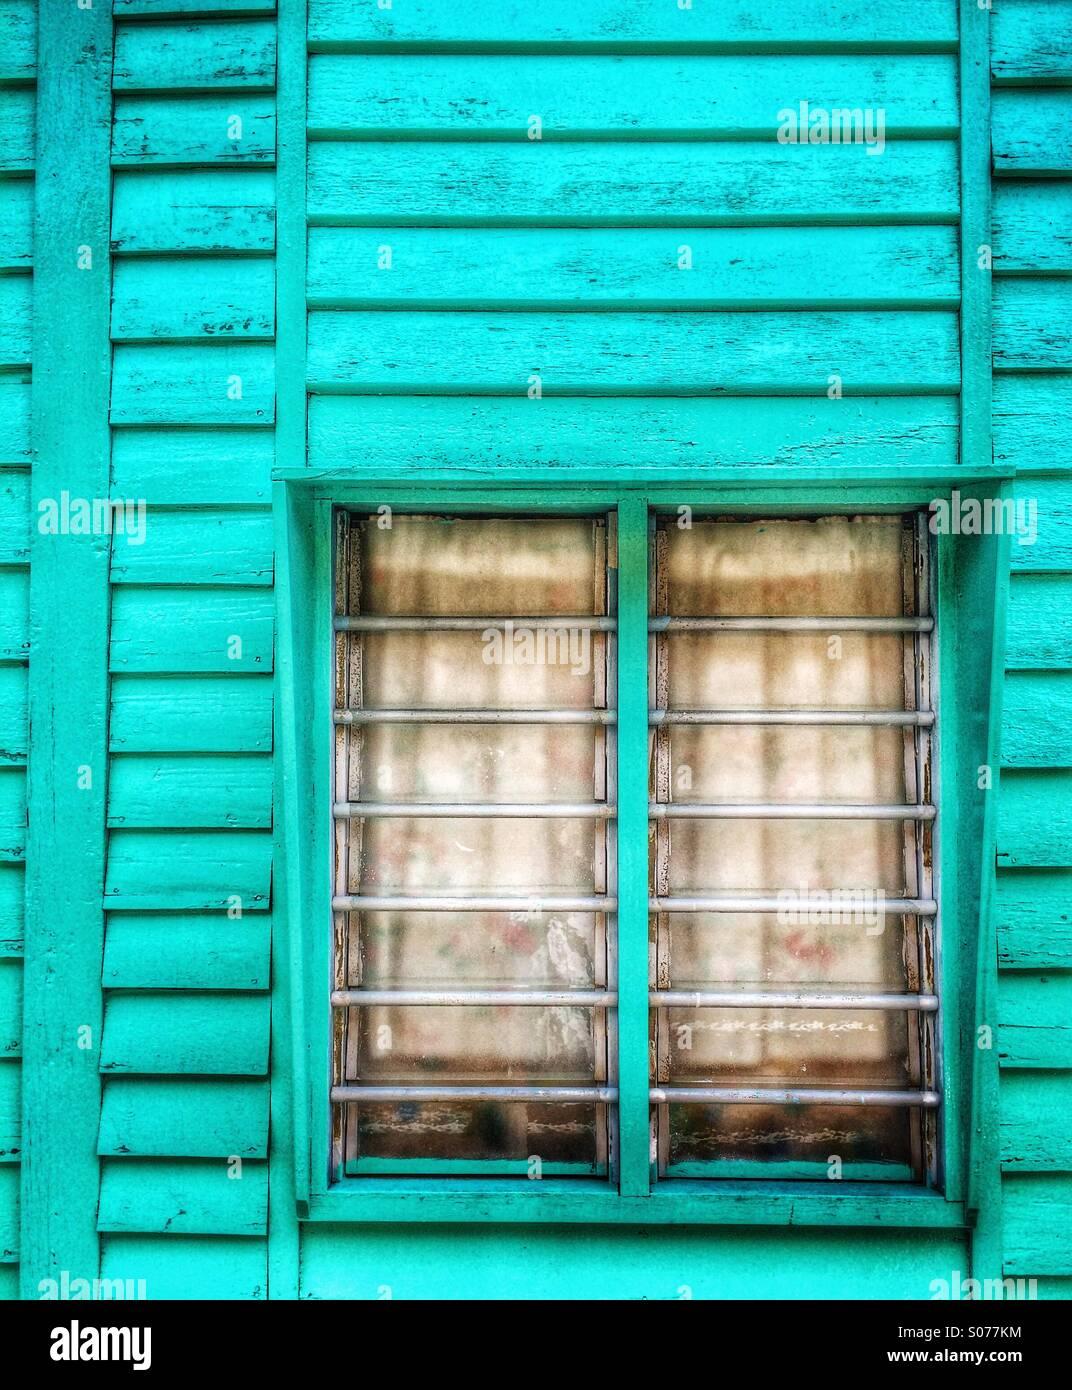 Malaysia old wooden house window at Crab Island fishing village Pulau Ketam - Stock Image